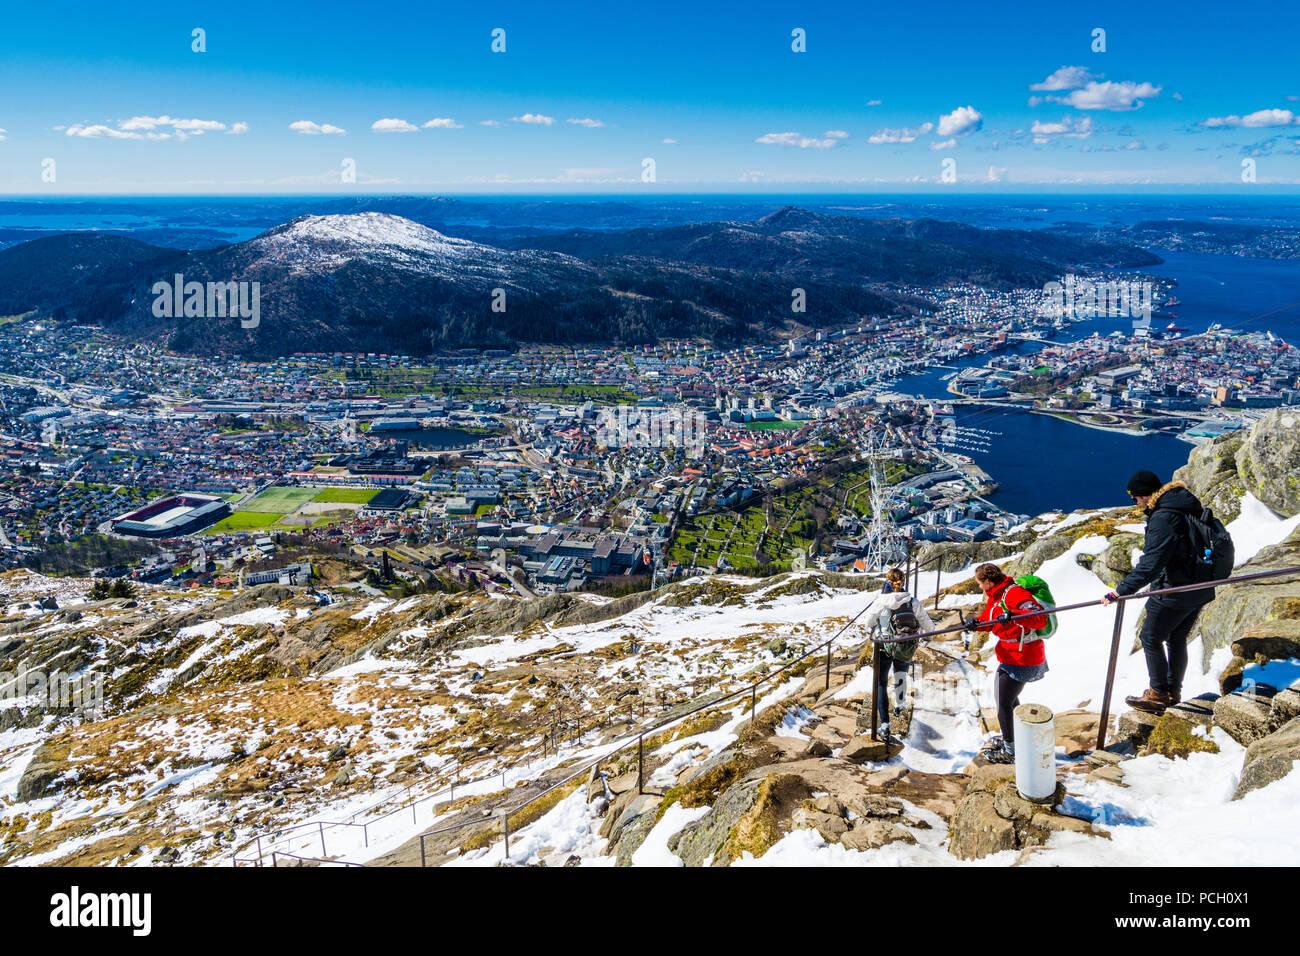 Early spring on mt Ulriken in Bergen, Norway - Stock Image